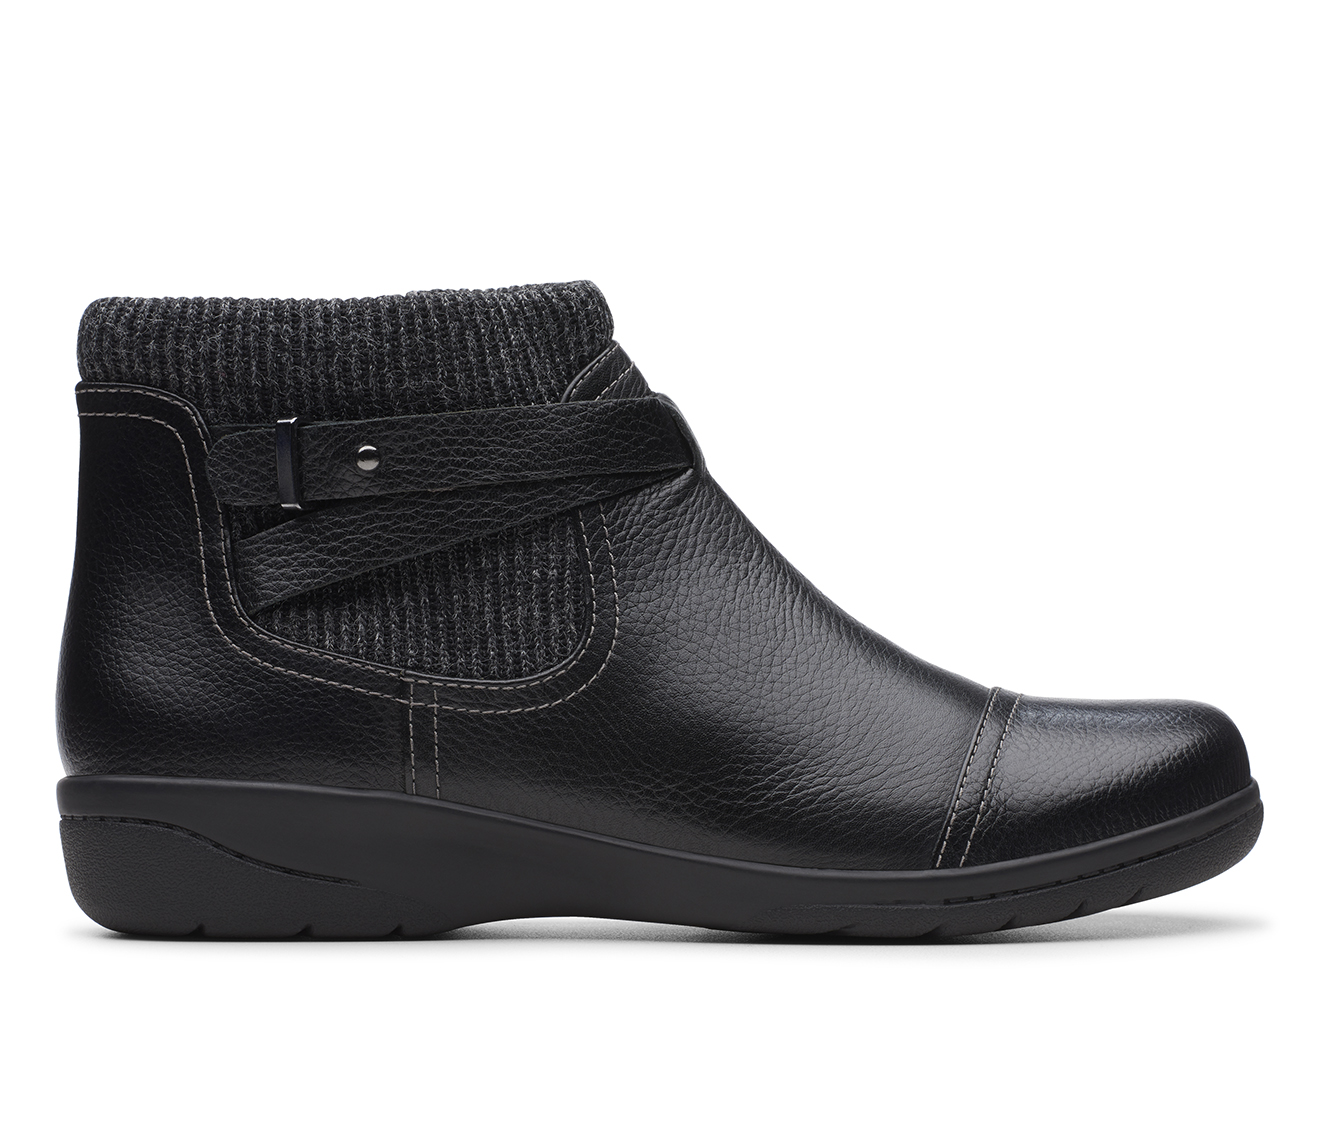 Clarks Cheyn Kisha Women's Boot (Black Leather)